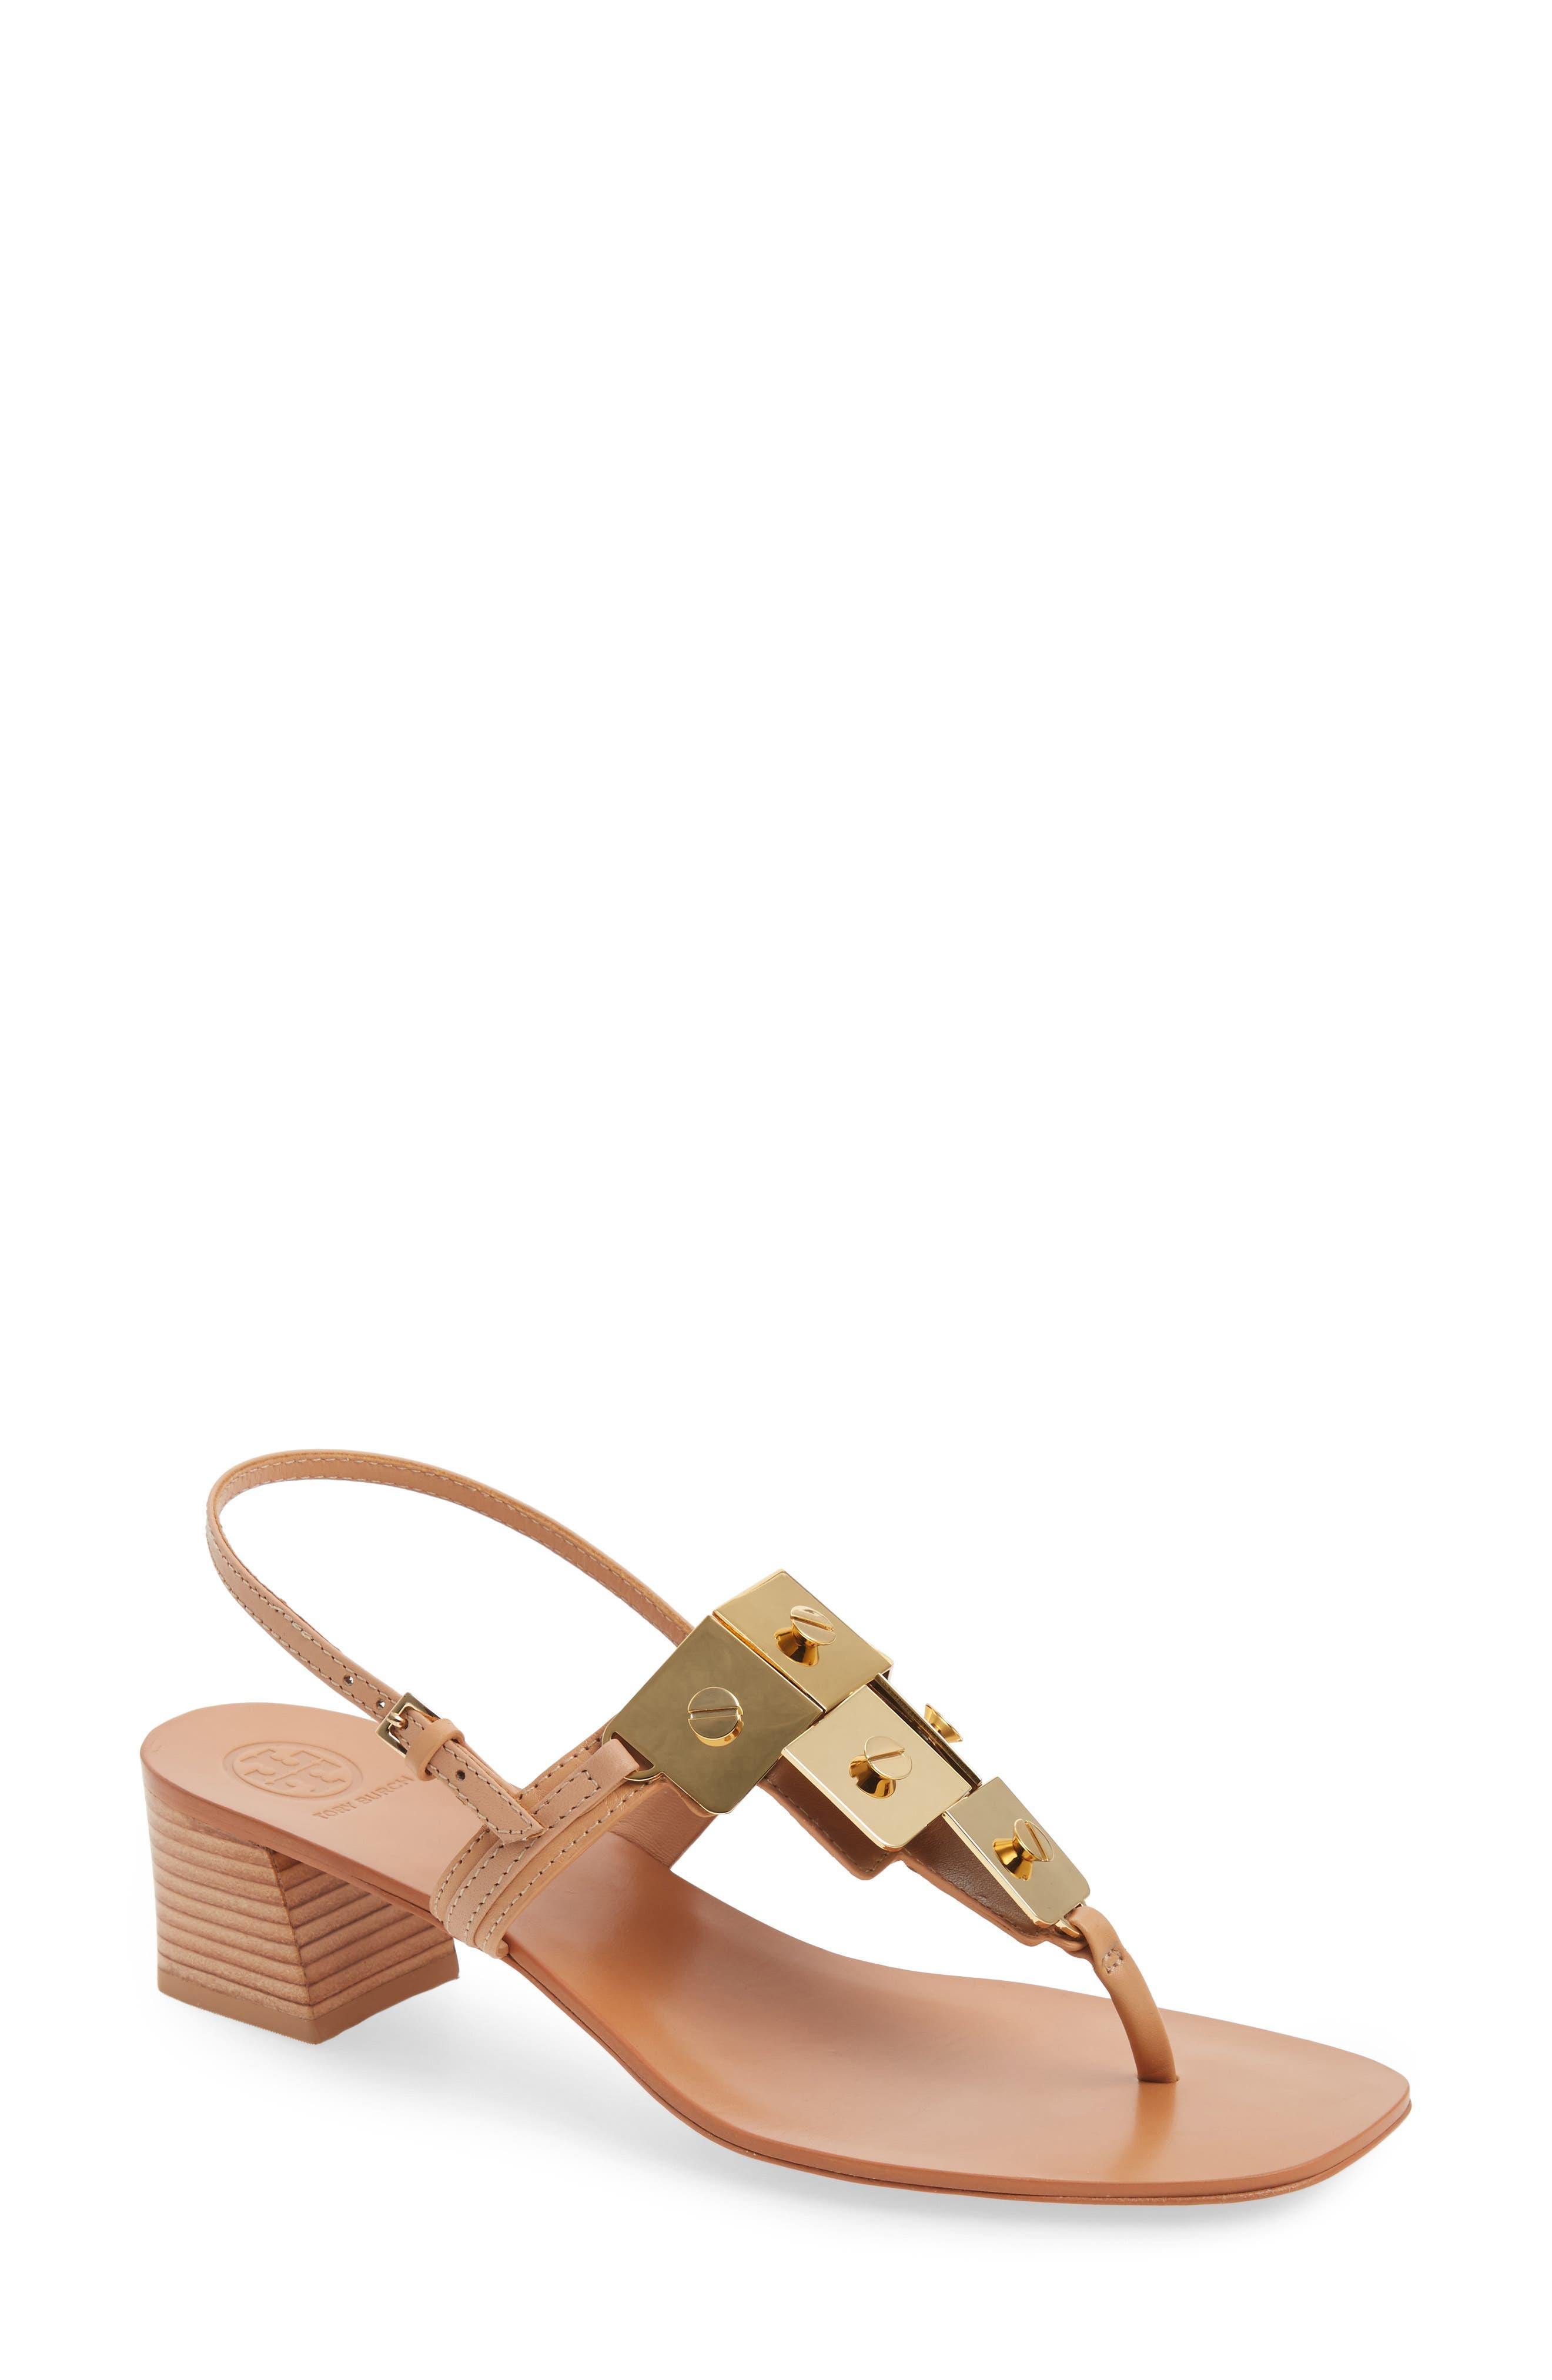 Main Image - Tory Burch Thompson Sandal (Women)